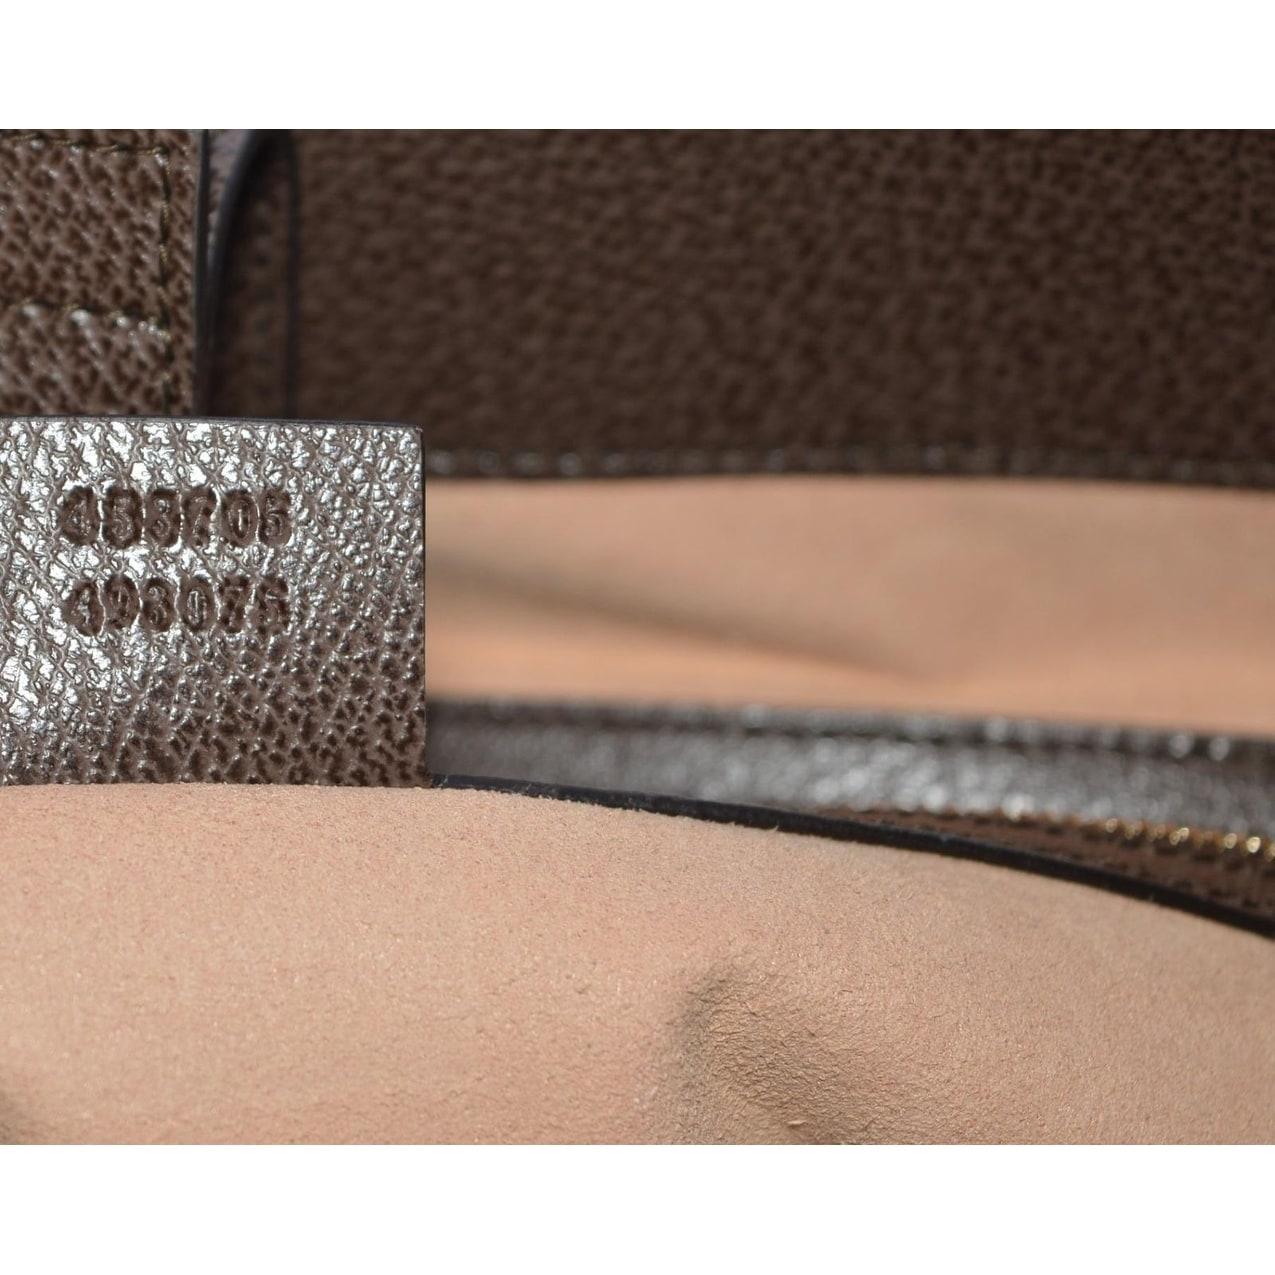 213b227bdc4e Shop Gucci Women's GG Supreme Bengal Tiger Crossbody Purse Bag Tote - Multi  - 14.5